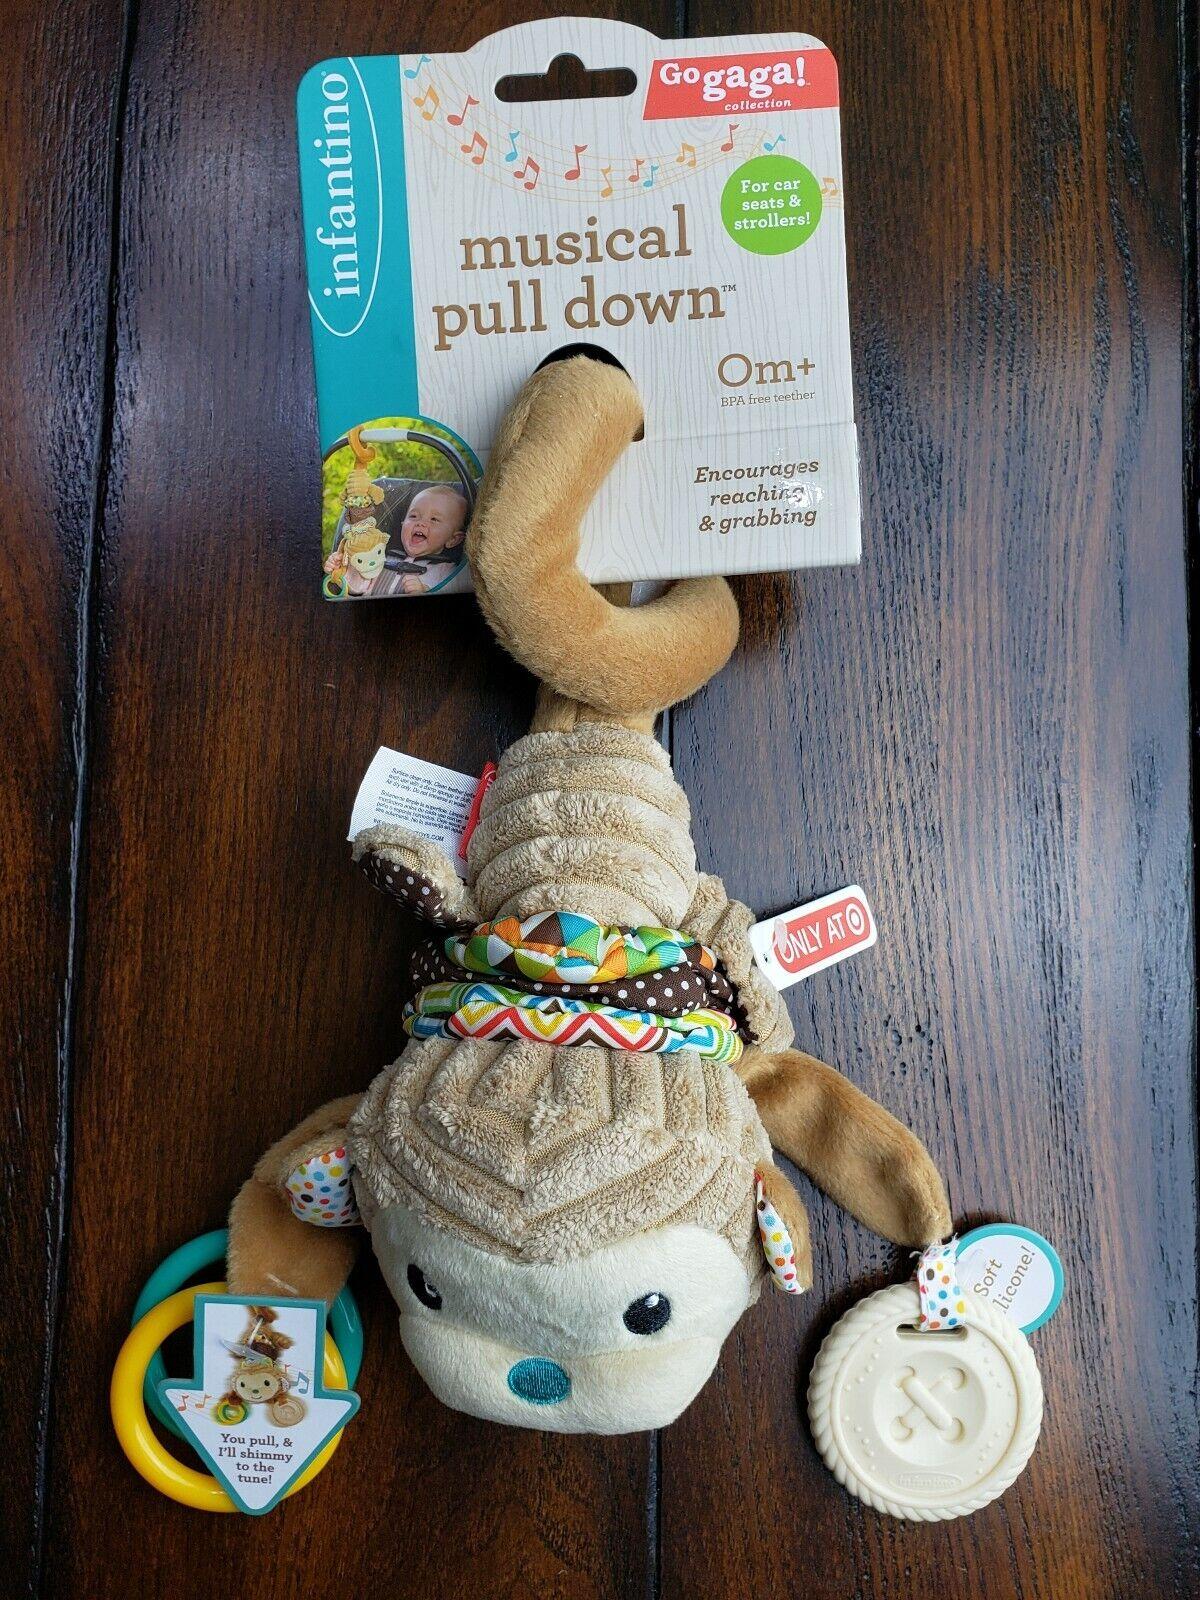 Infantino Go GaGa Musical Pull Down